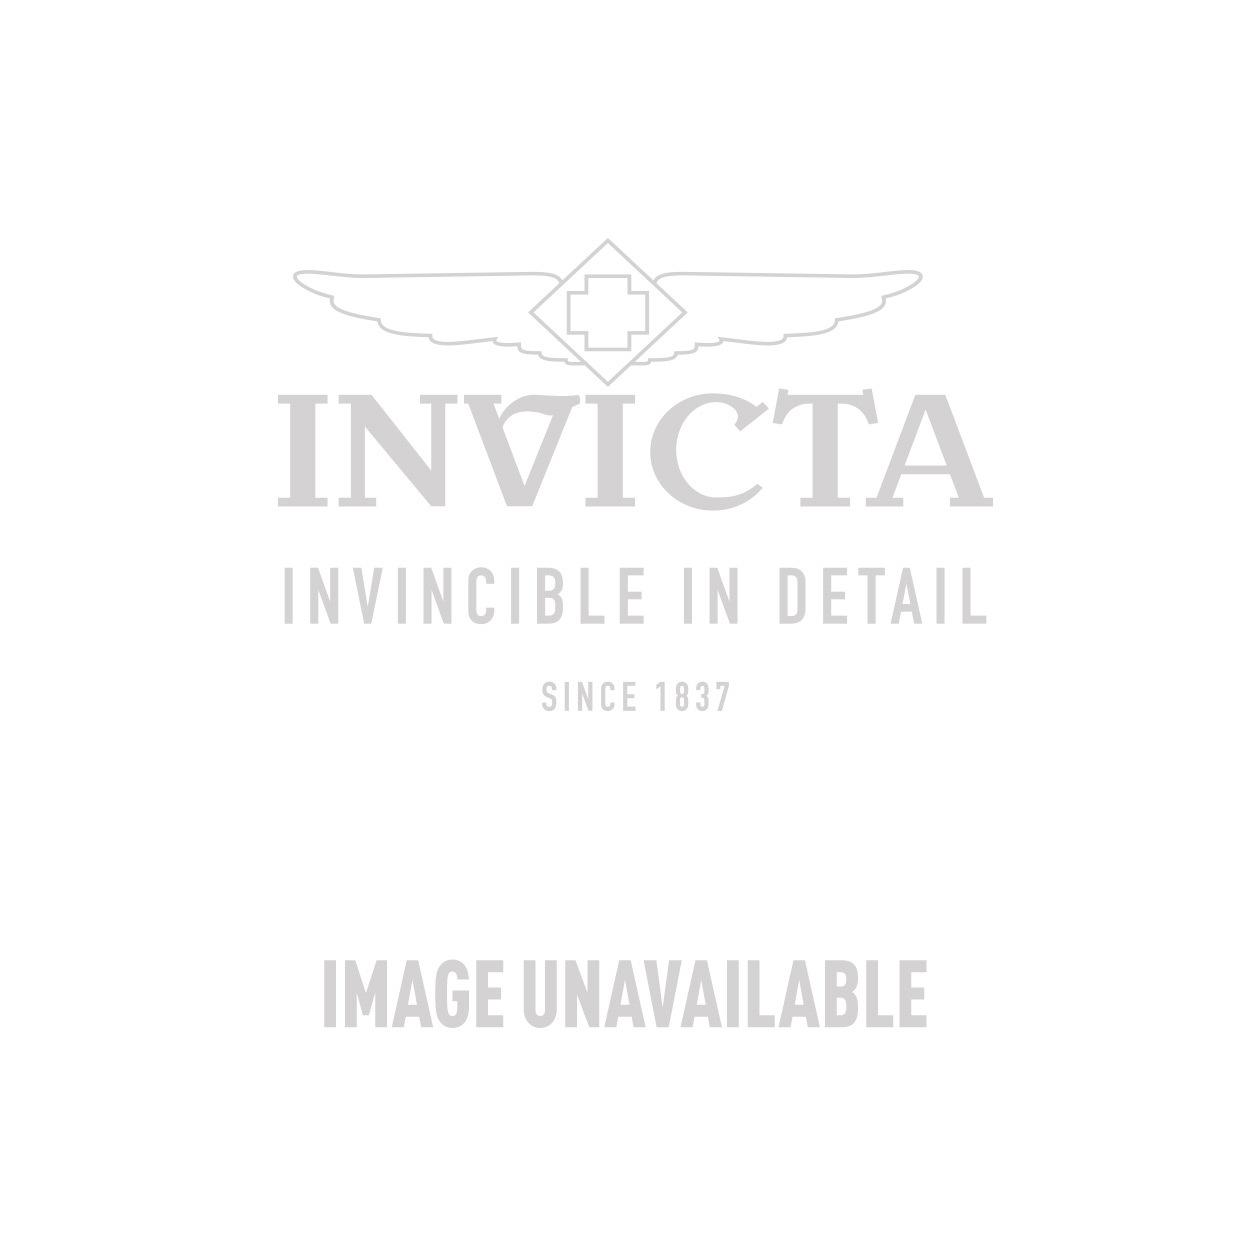 Invicta I-Force Quartz Watch - Rose Gold, Black case with Black tone Silicone band - Model 16977